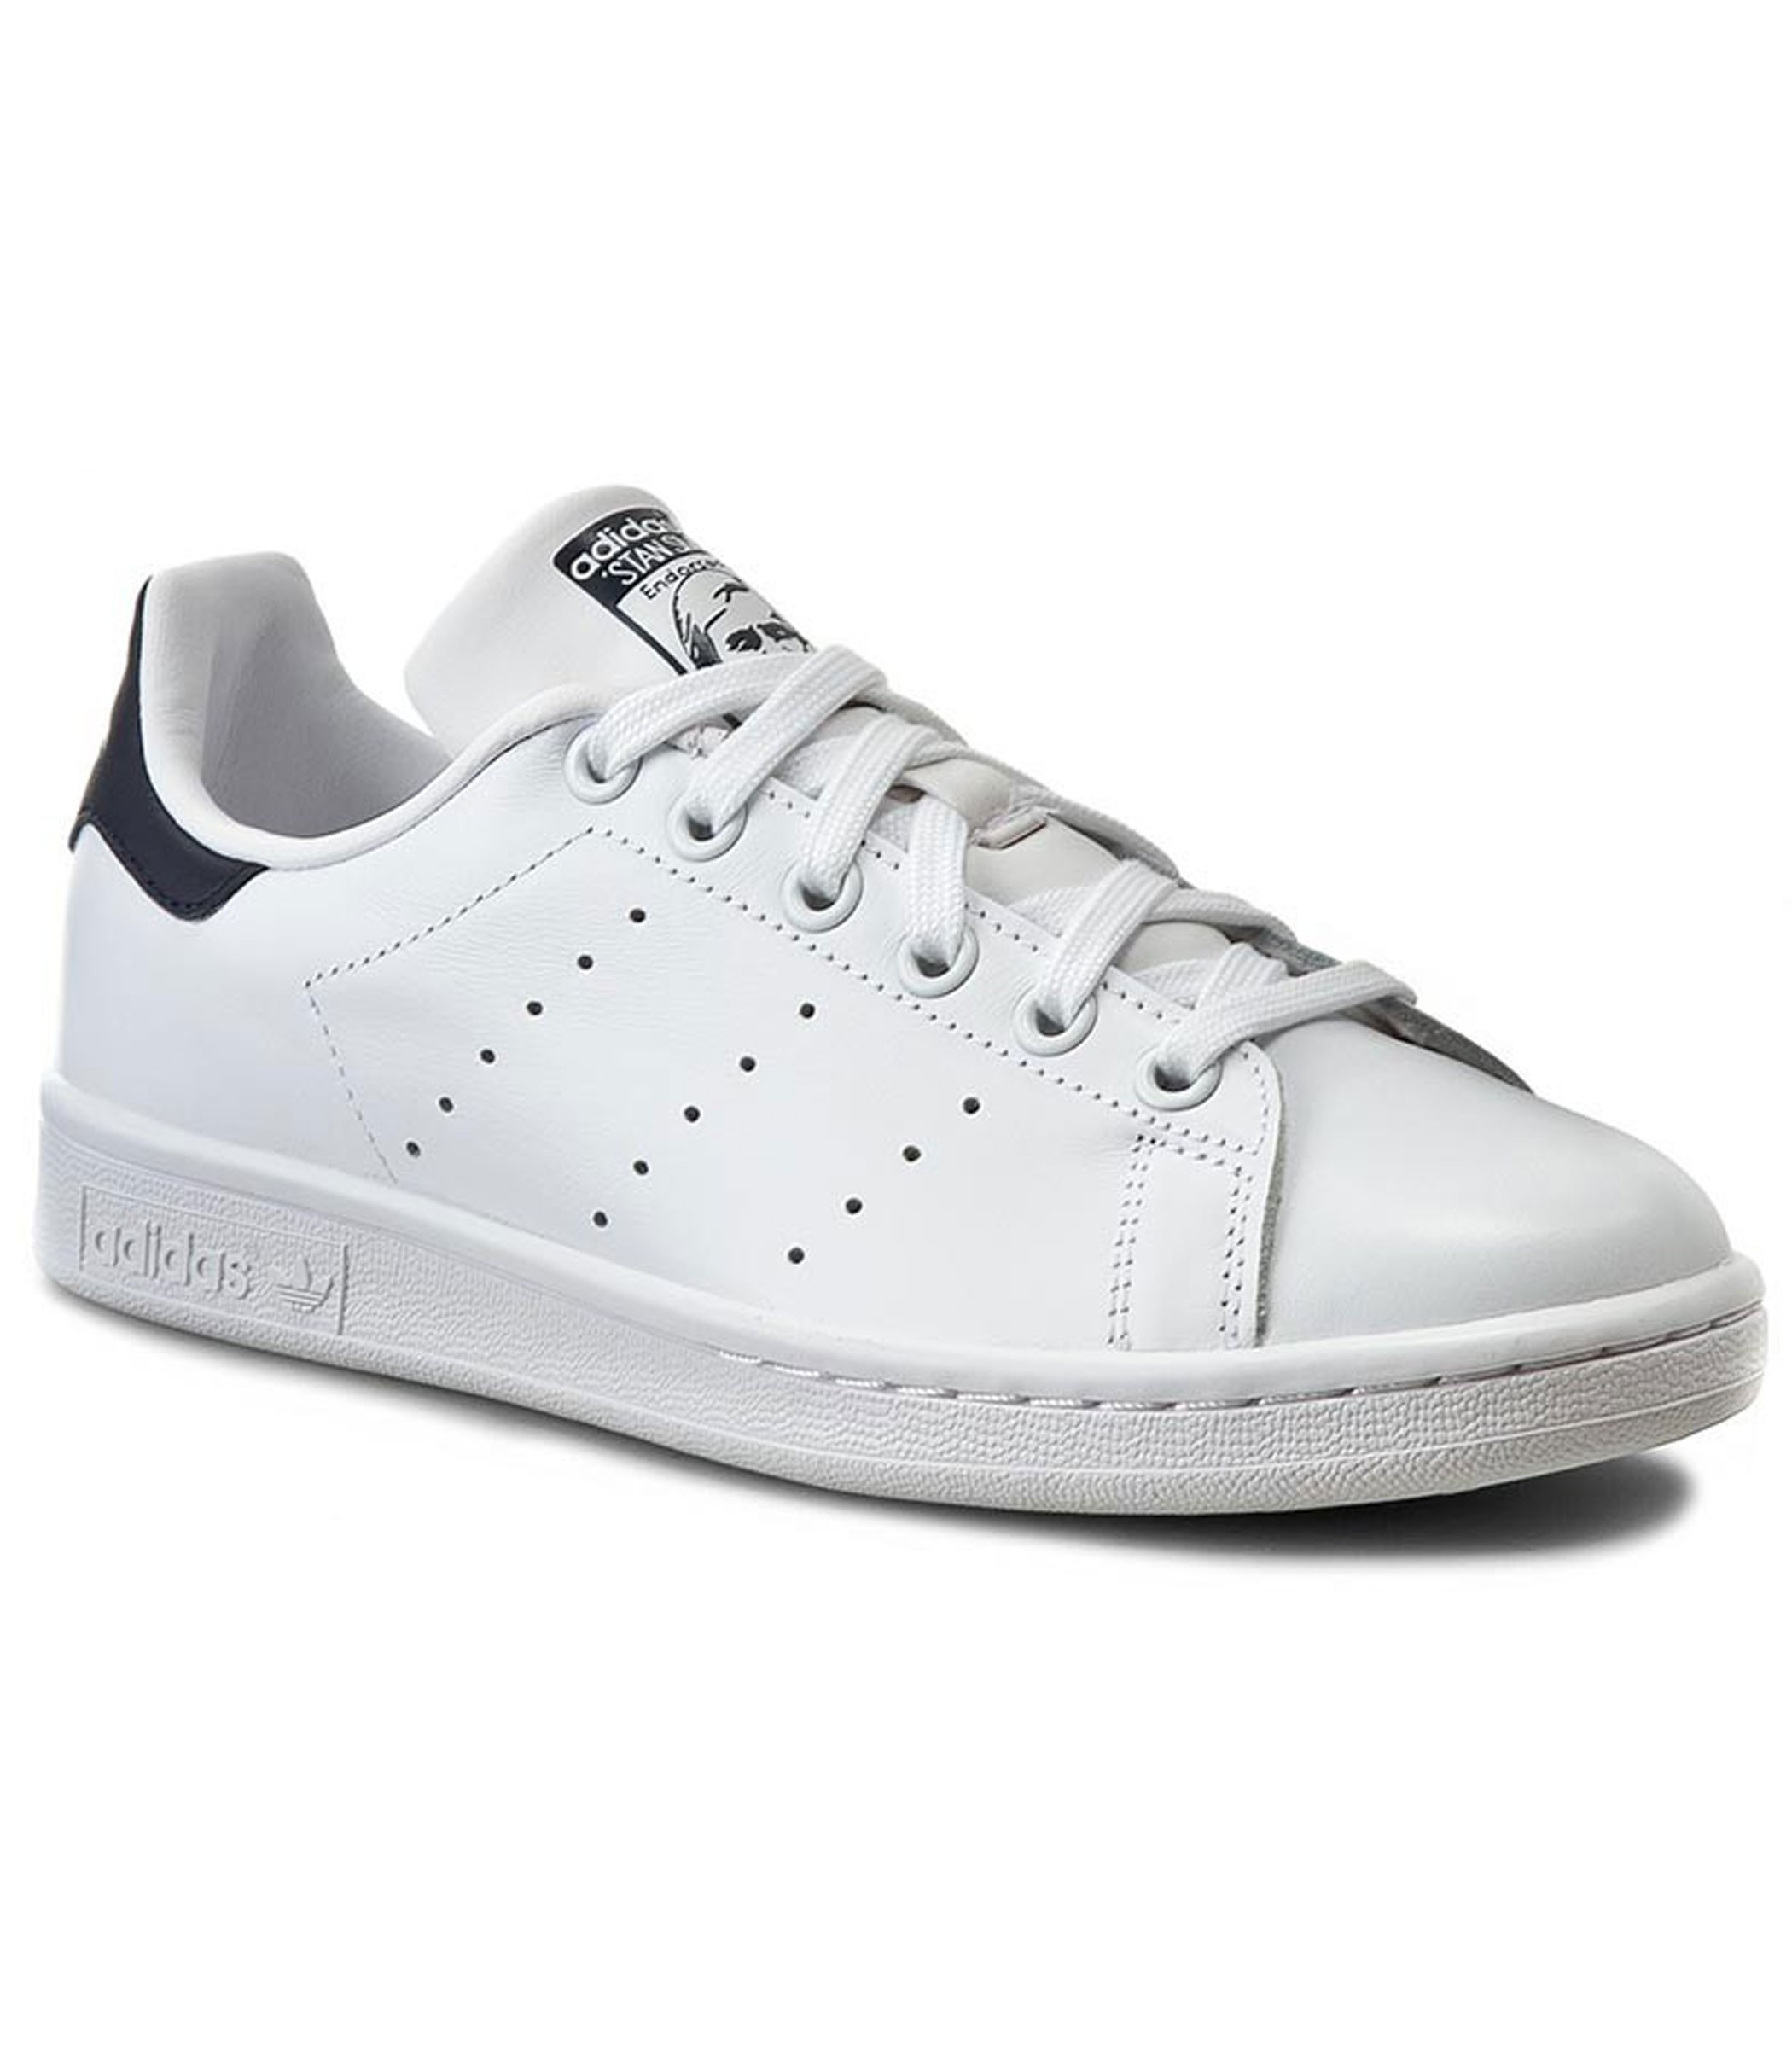 reputable site a24f7 b9fed Scarpe Stan Smith Adidas da uomo bianco blu rif.M20325